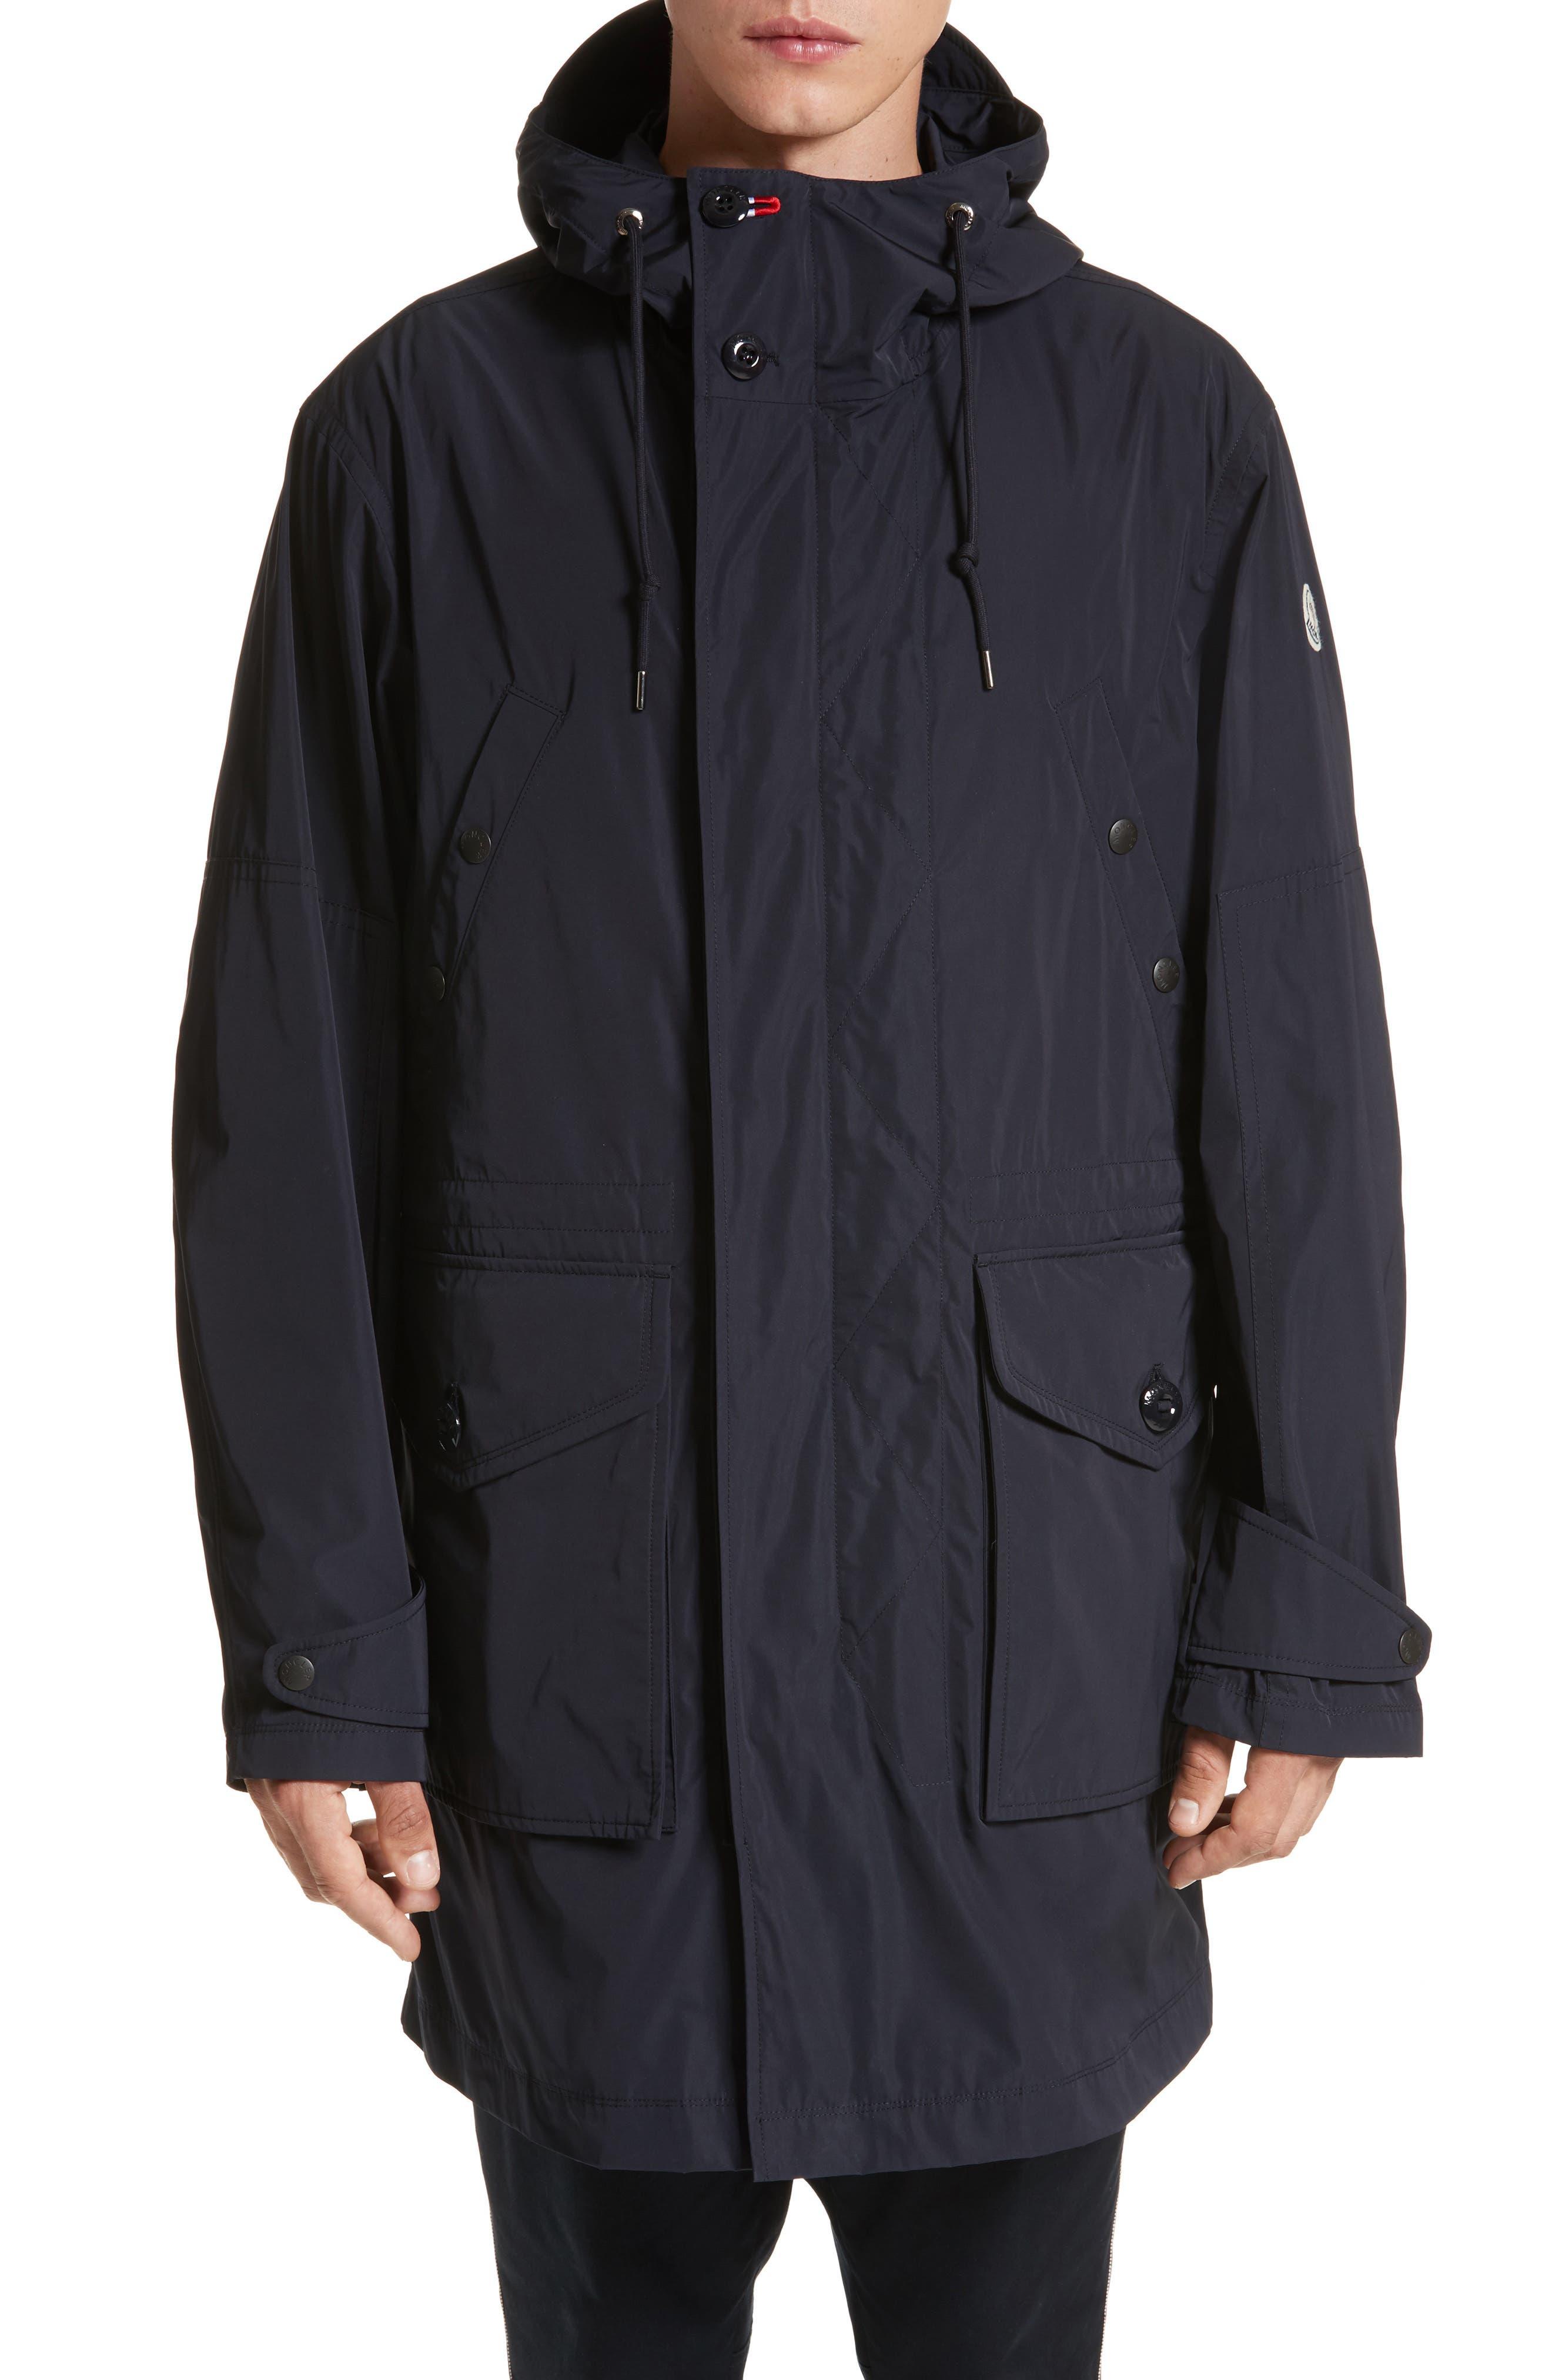 Guiers Long Raincoat,                         Main,                         color, Navy